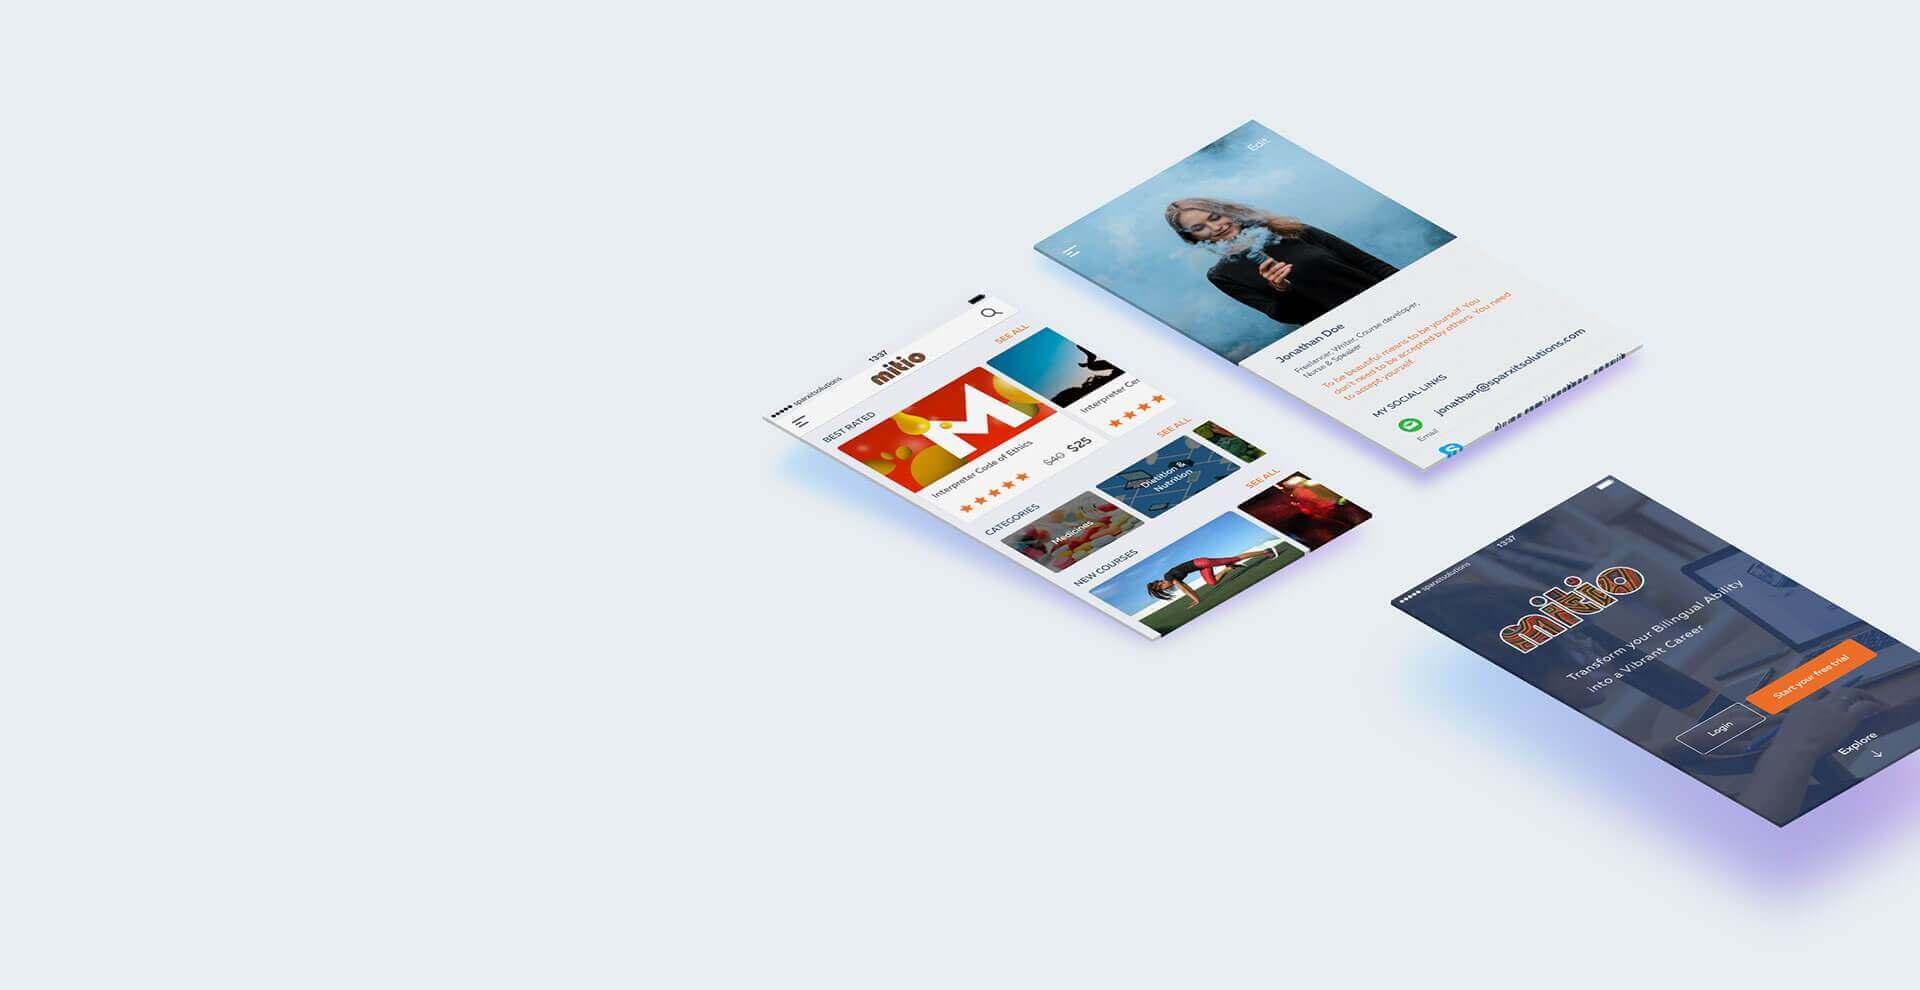 Integrating Brands in Mobile App Designs